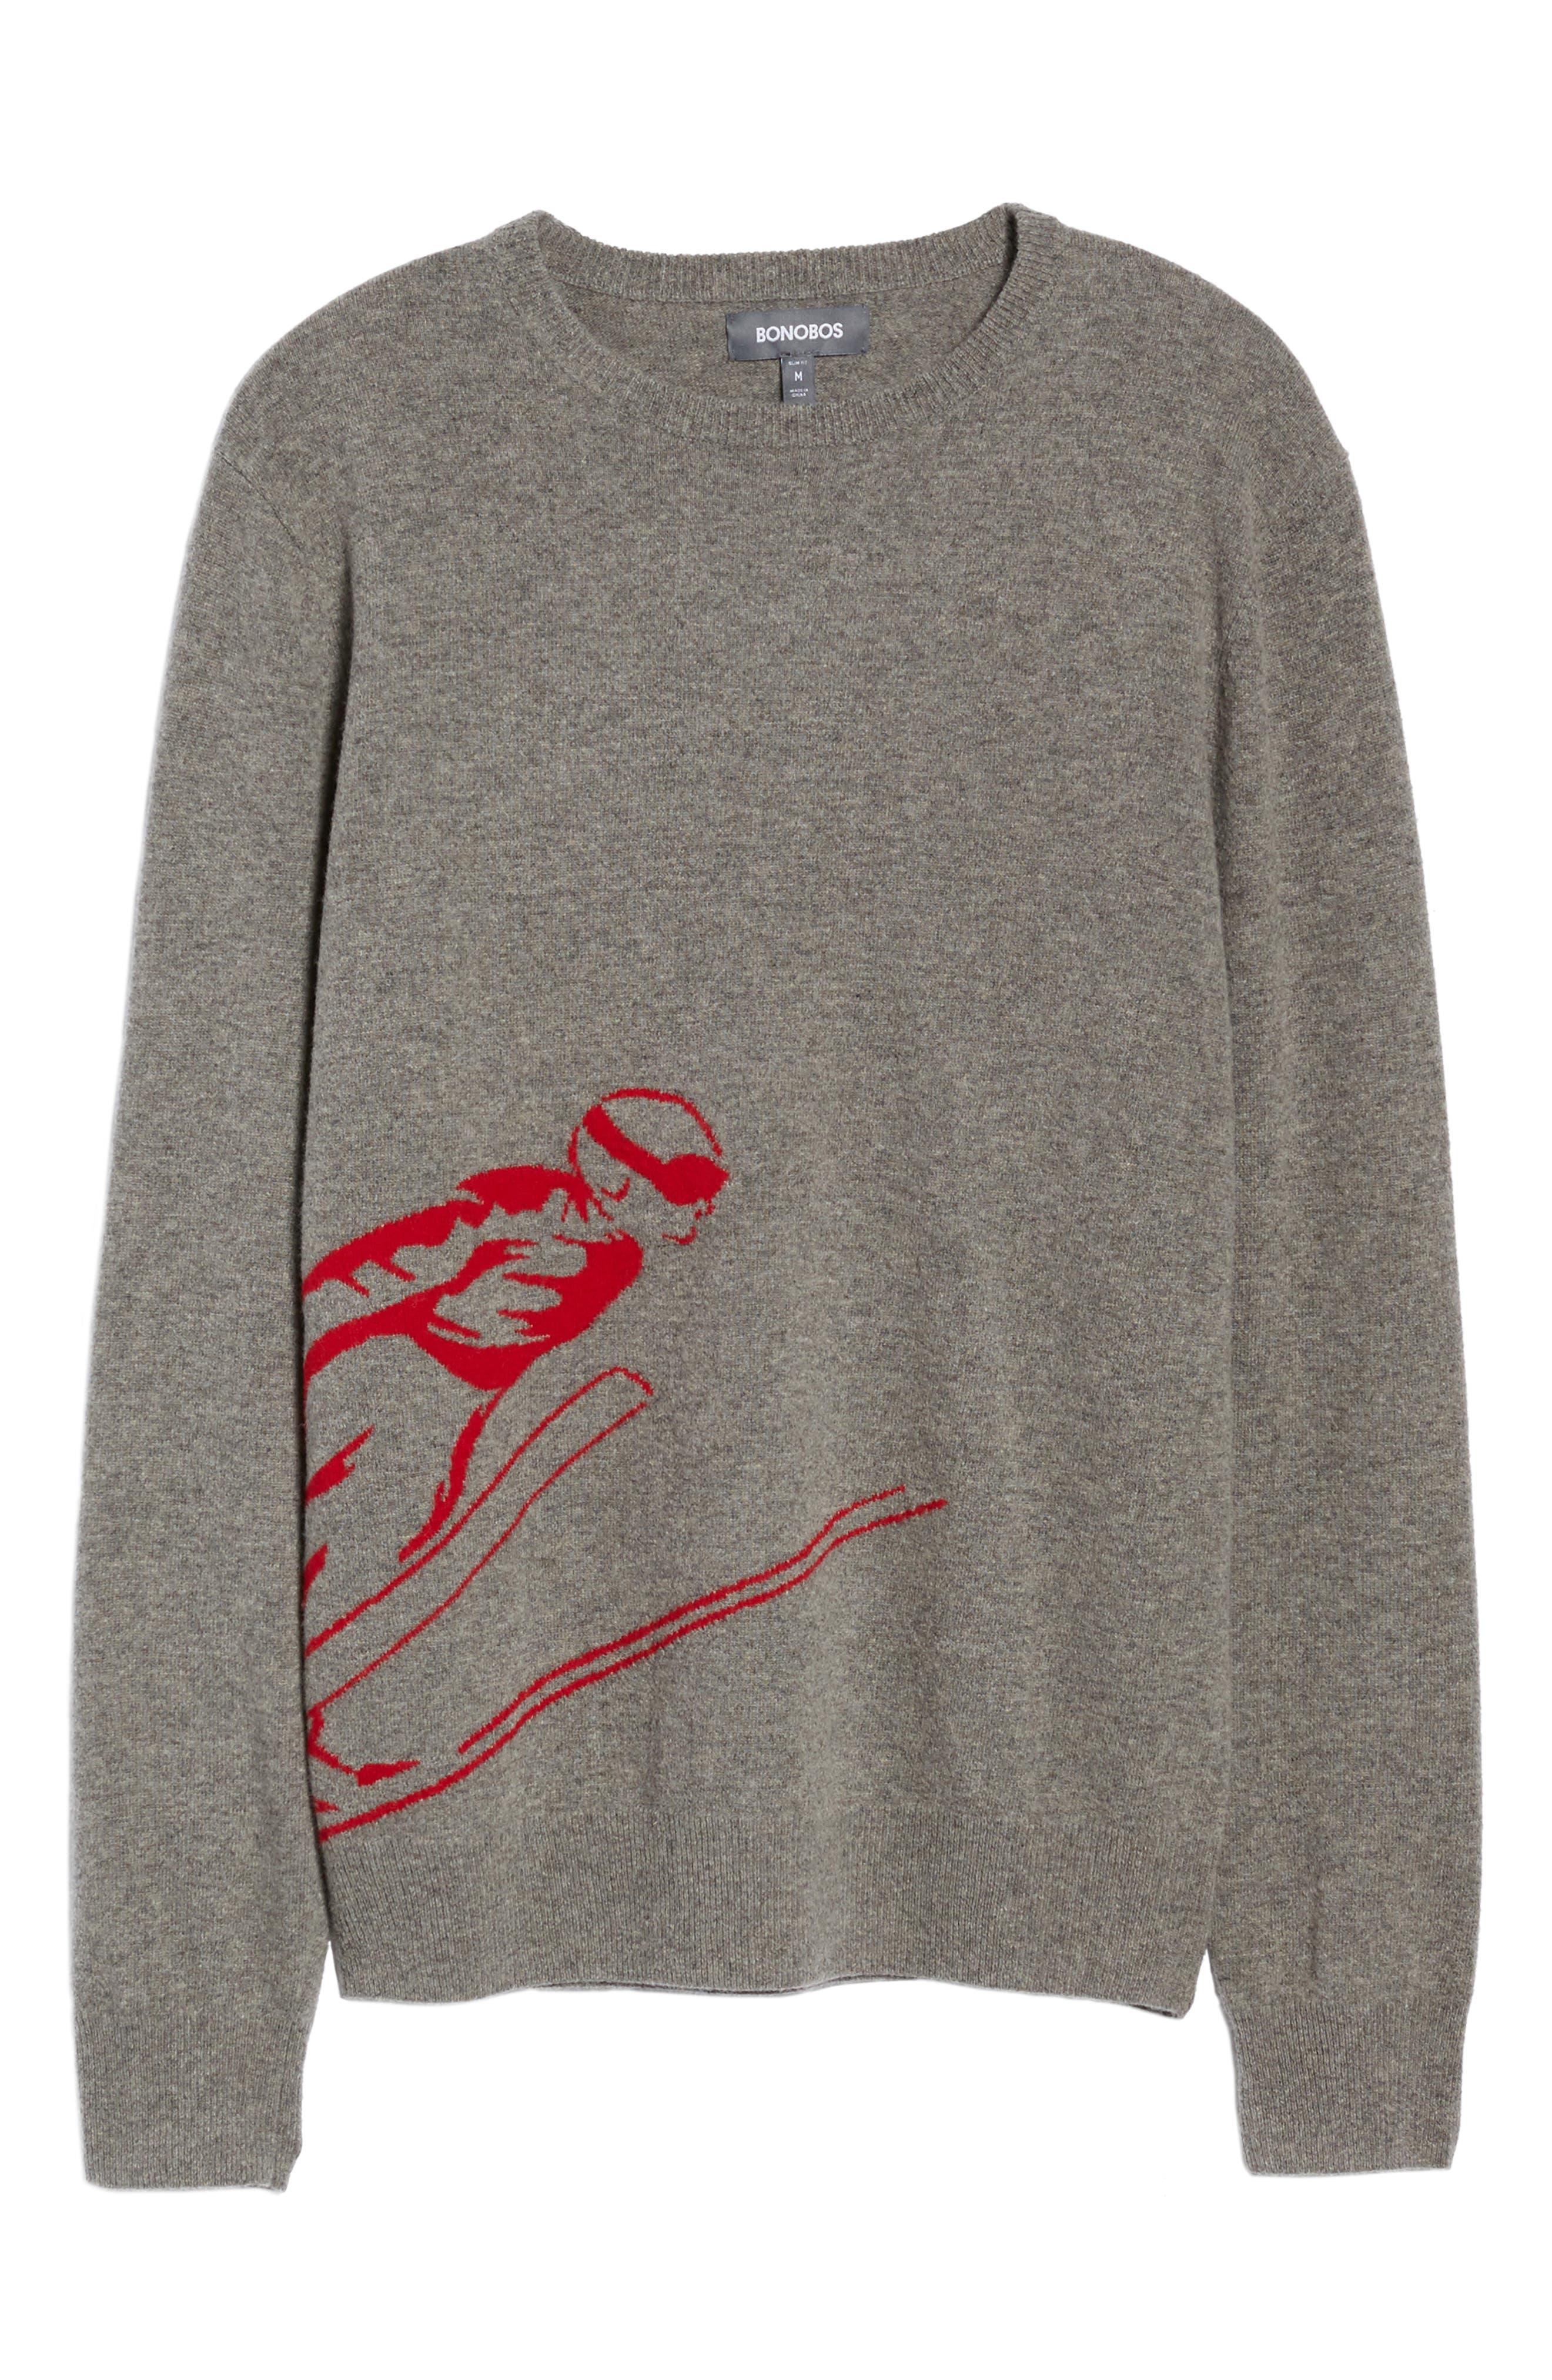 Skier Wool Blend Sweater,                             Alternate thumbnail 6, color,                             Mid Grey/ Crimson